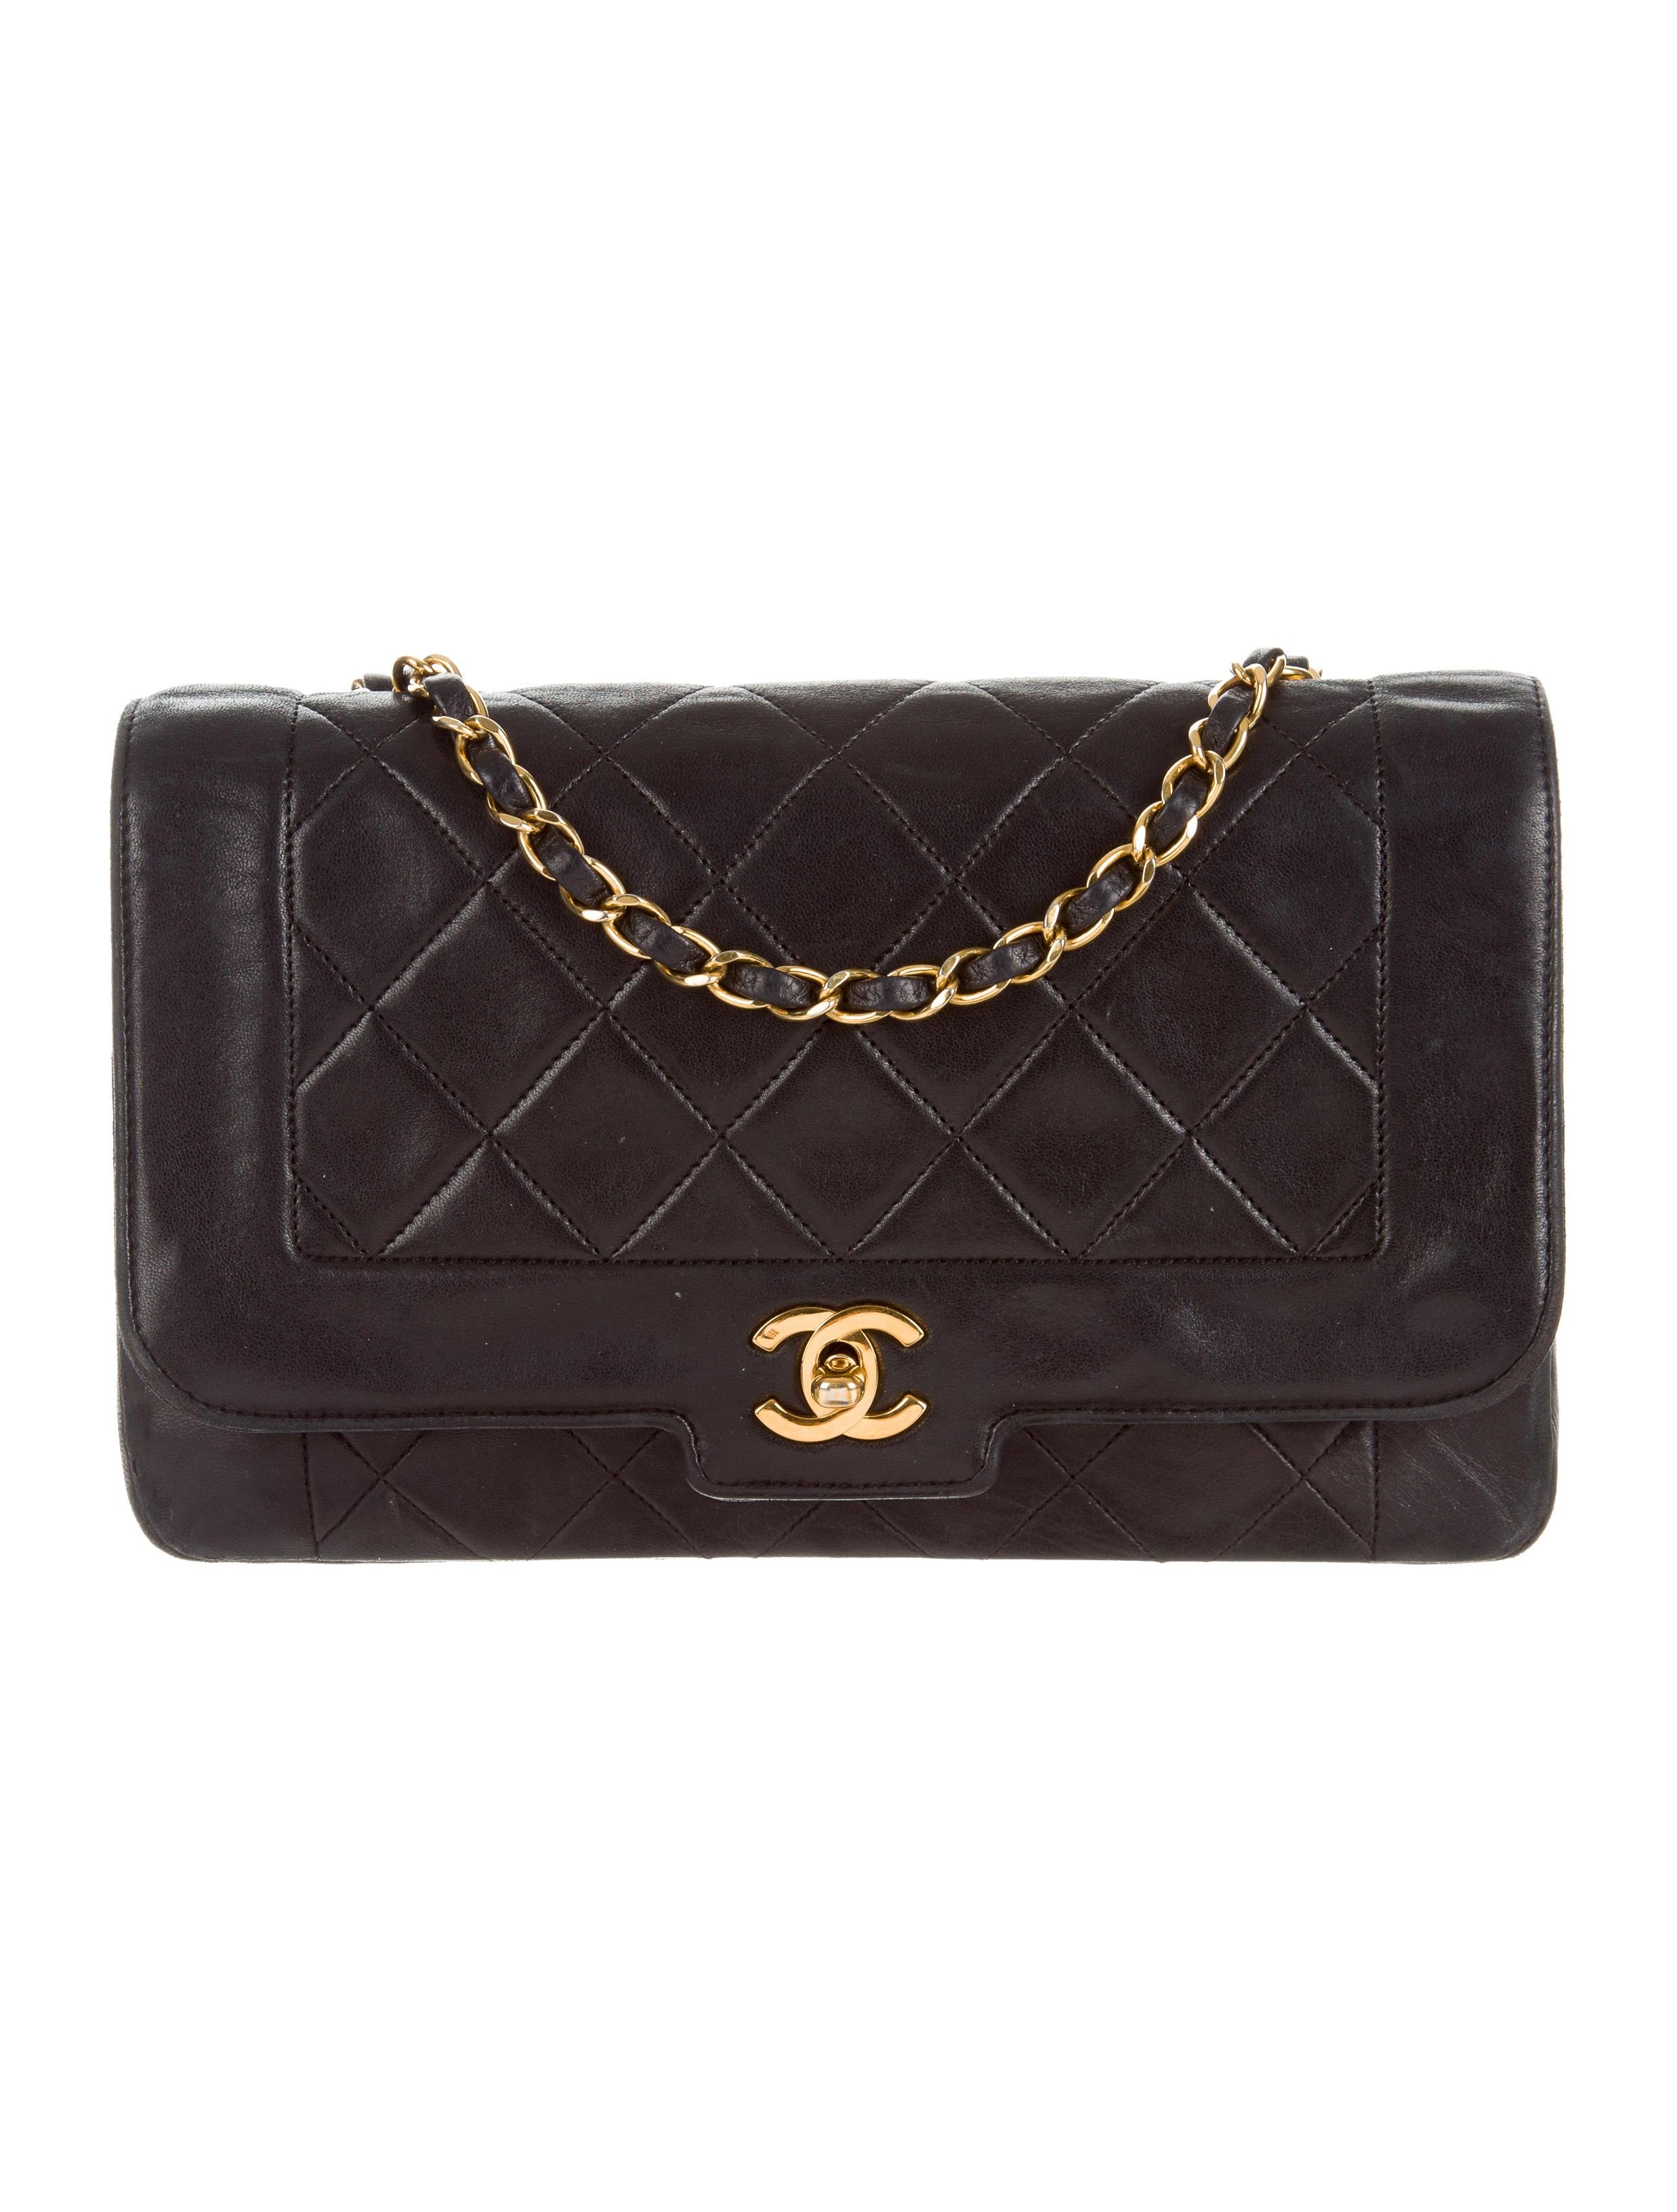 Chanel Vintage Lambskin Flap Bag - Handbags